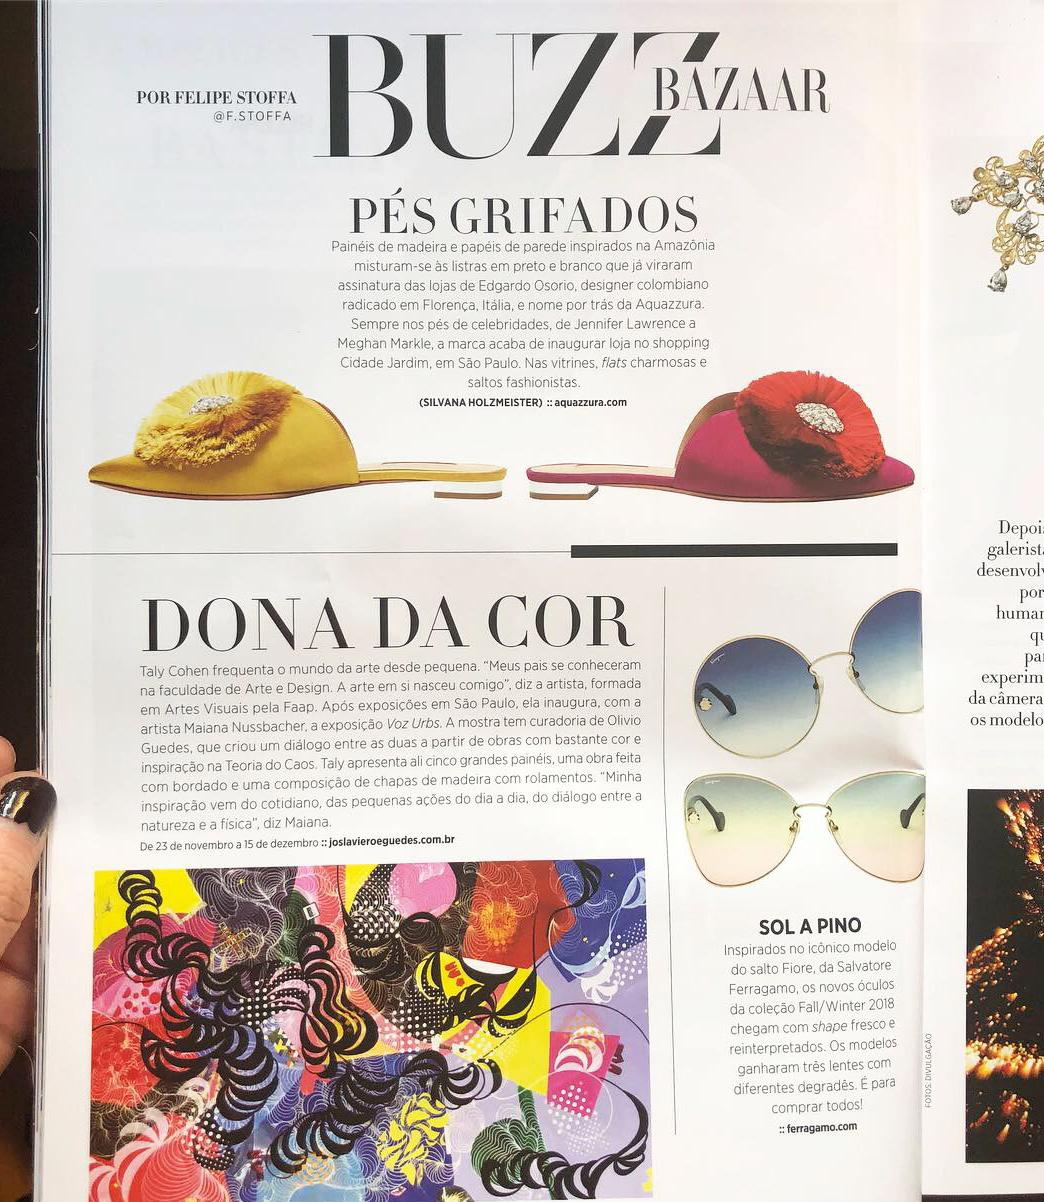 Harper's Bazaar | Revista impressa